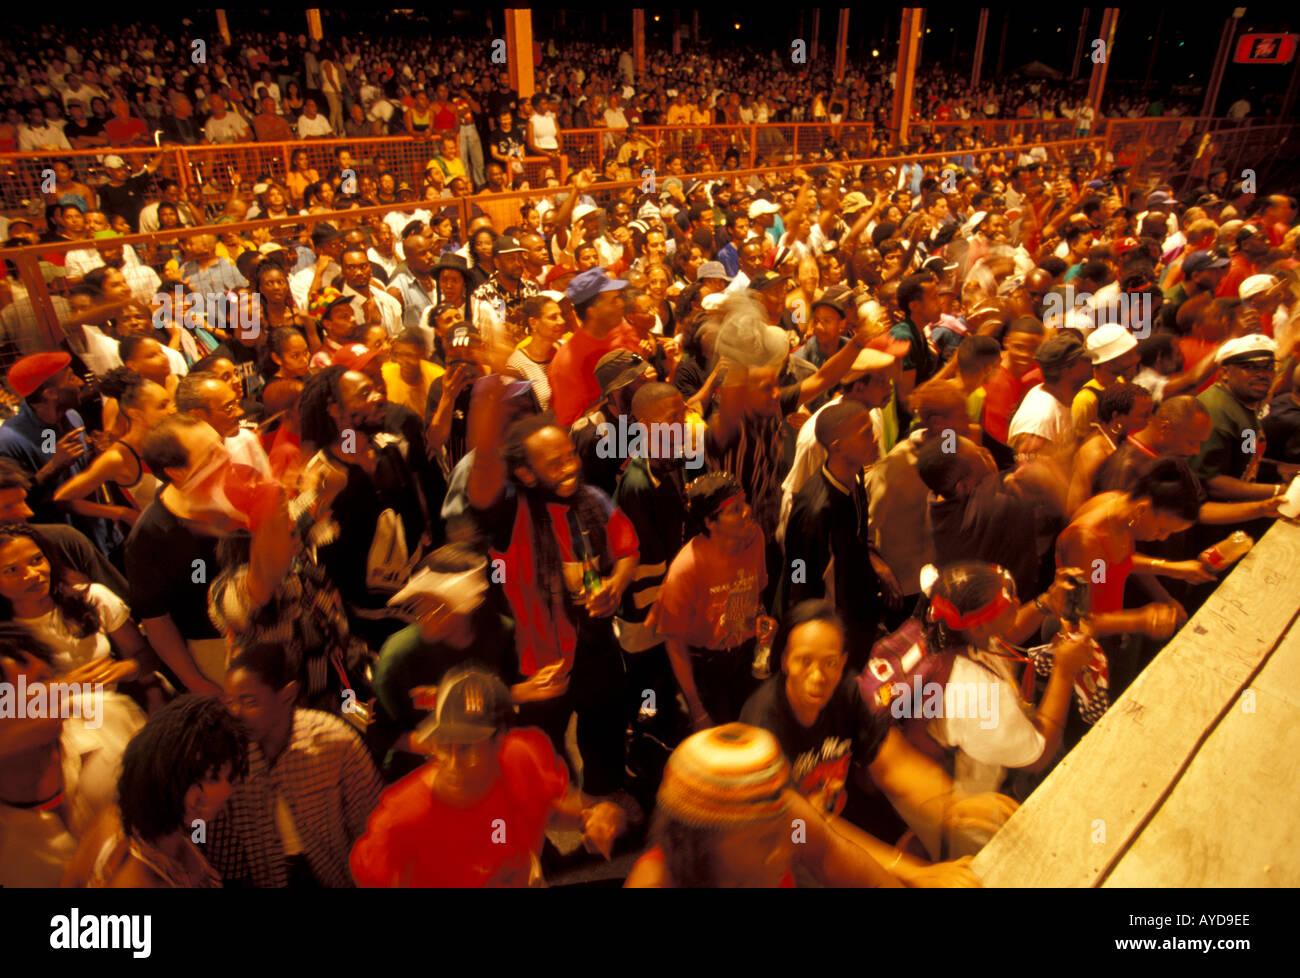 Trinidad Karneval Band Wettbewerb Publikumsreaktion Stockbild